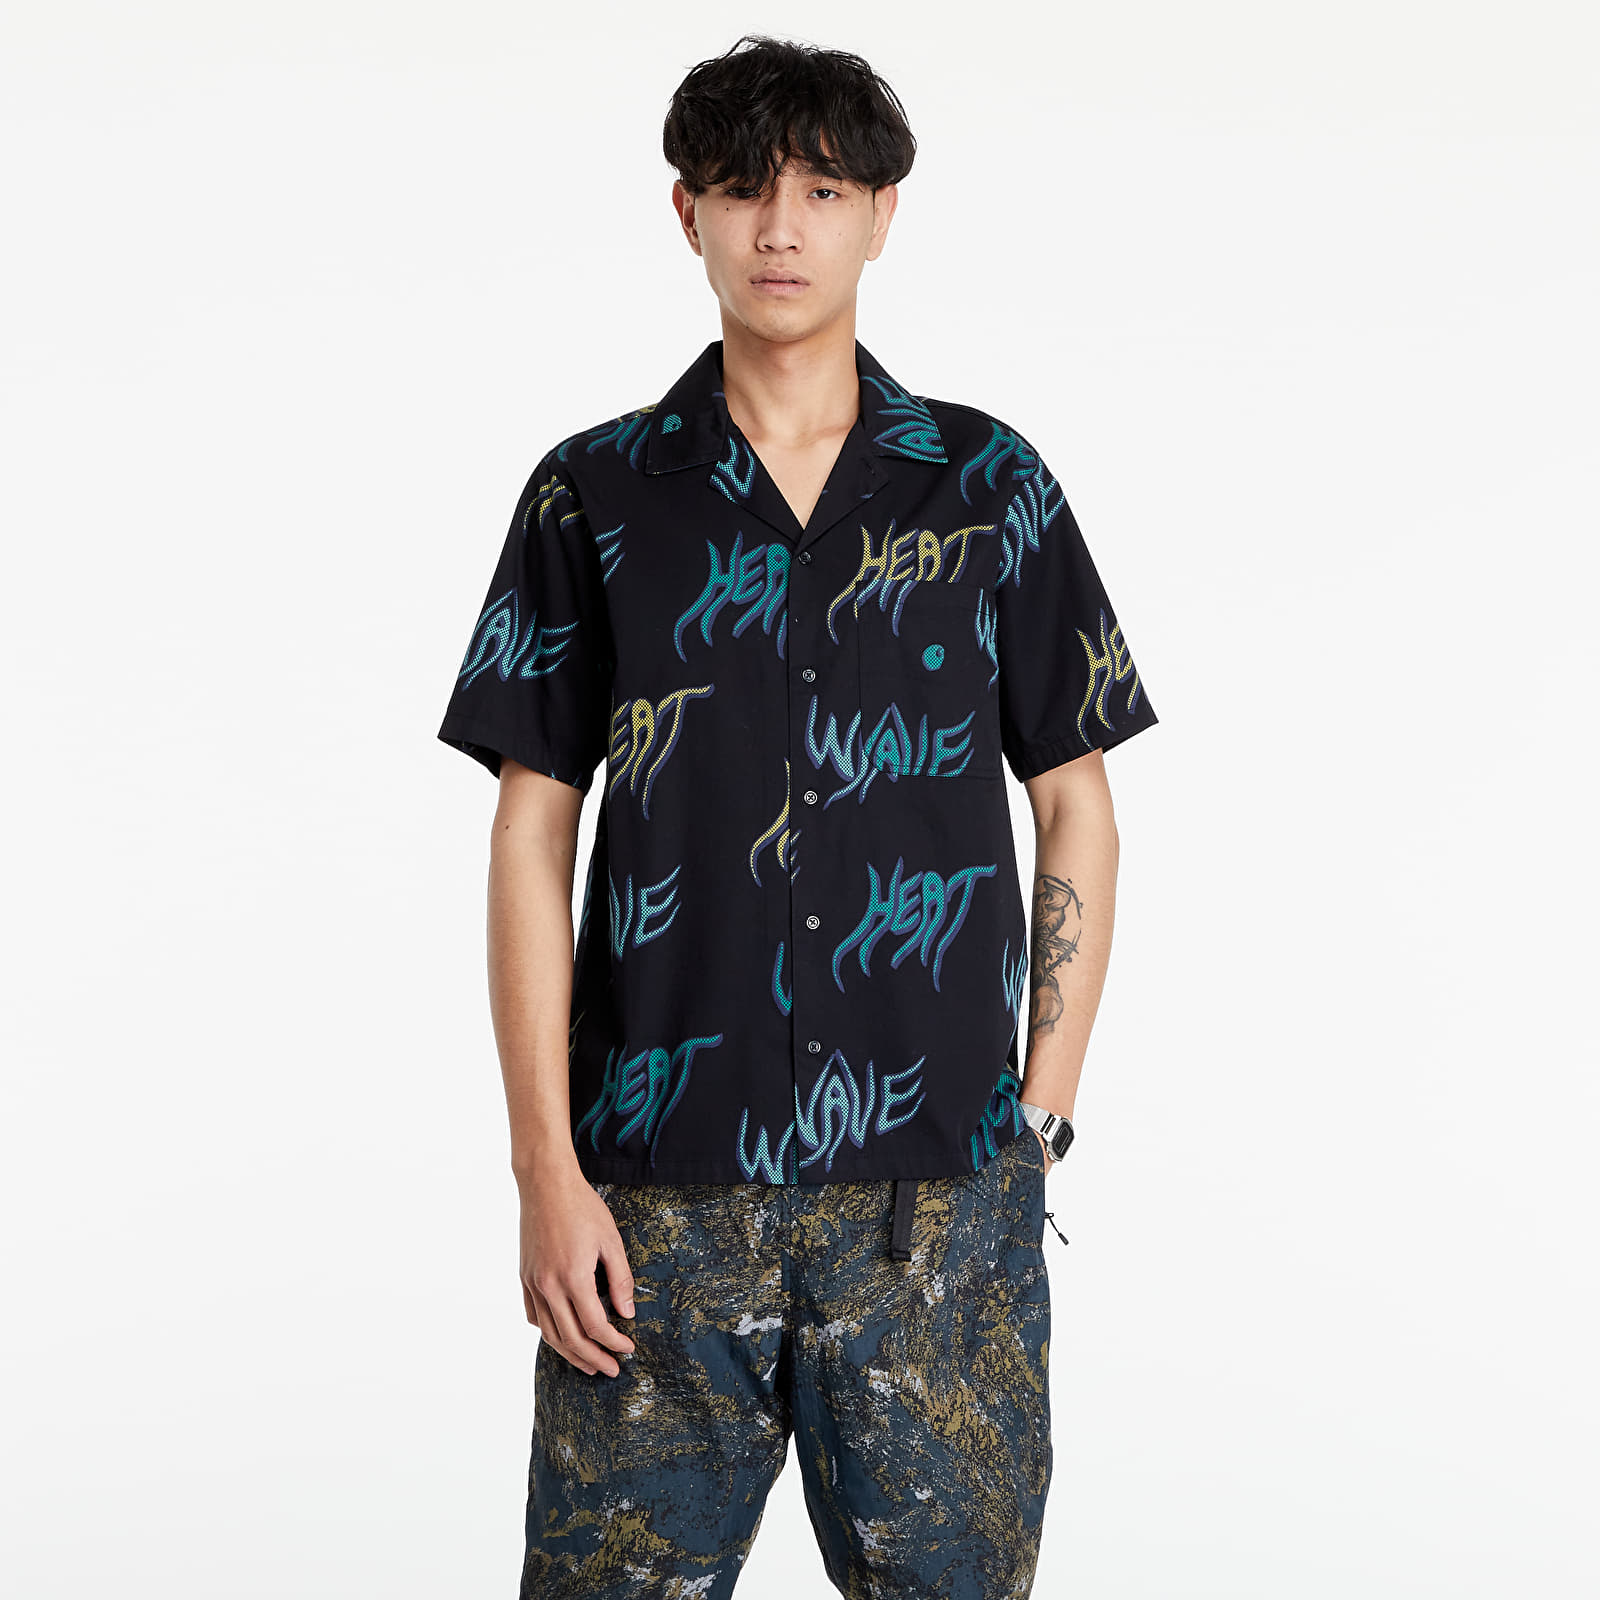 Carhartt WIP Short Sleeve Heat Wave Shirt Heat Wave Print/ Black S